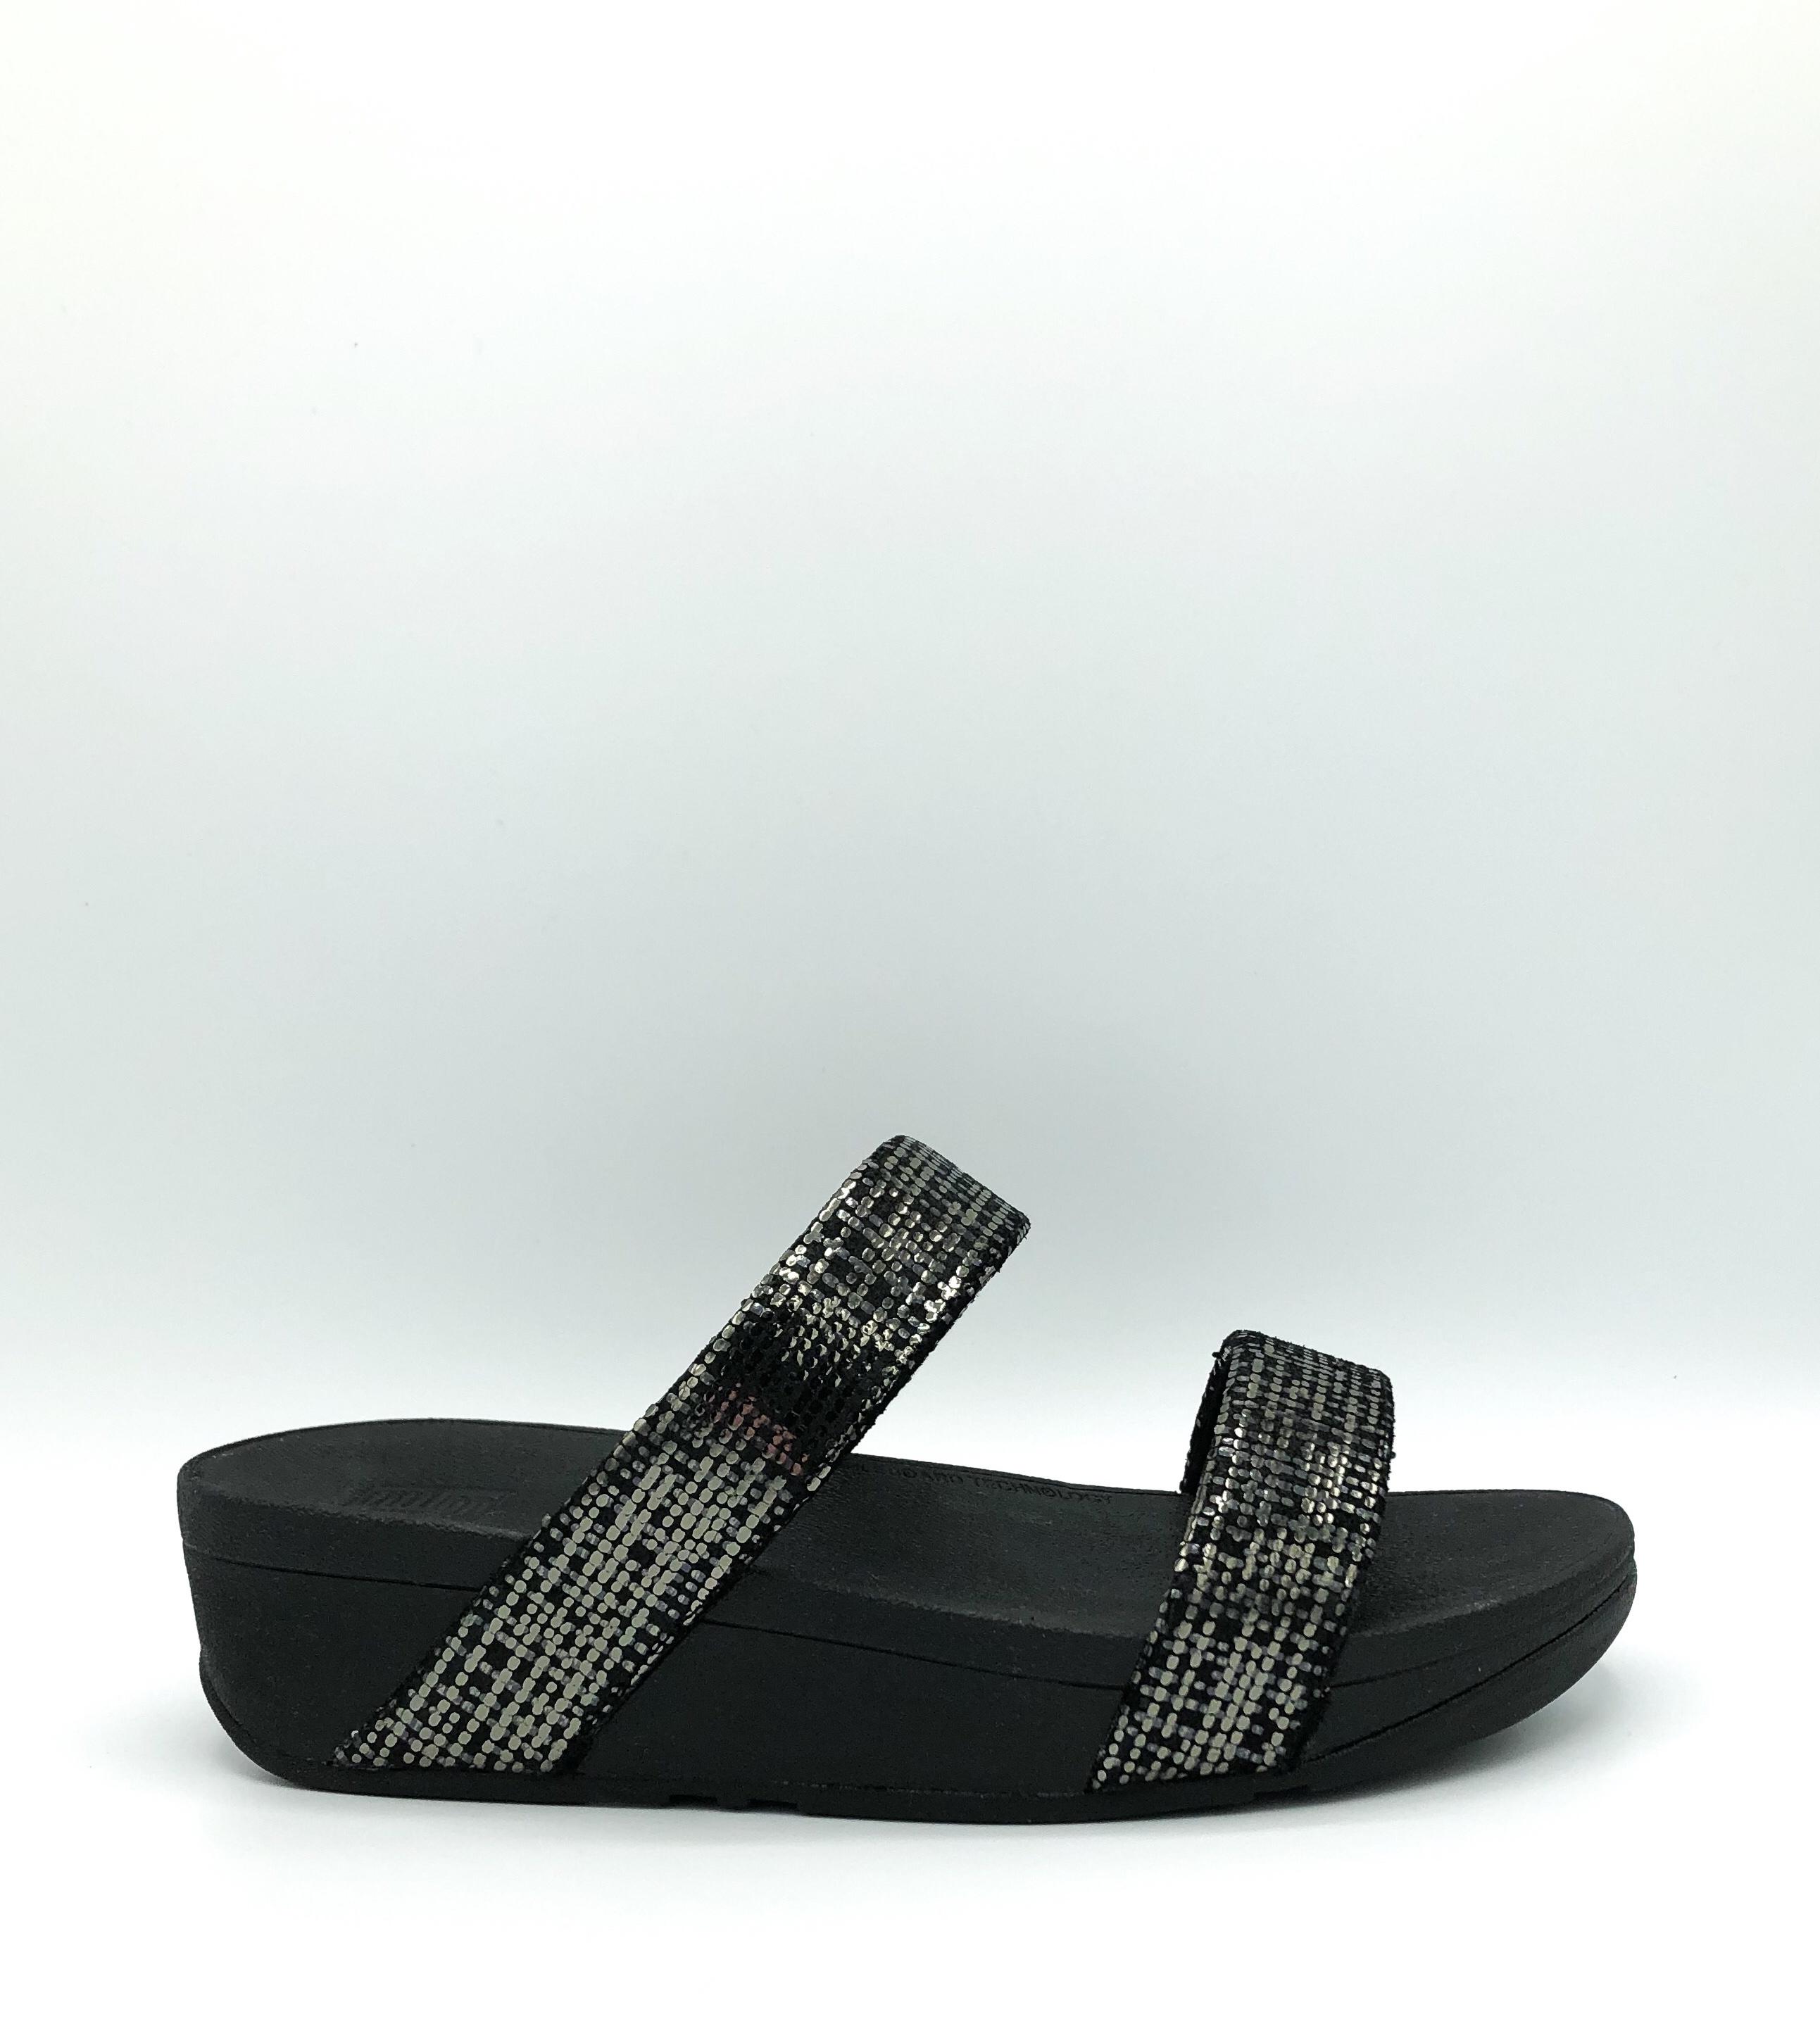 b67ad419b85 FIT FLOP - LOTTIE CHAIN PRINT SLIDE IN BLACK - the Urban Shoe Myth